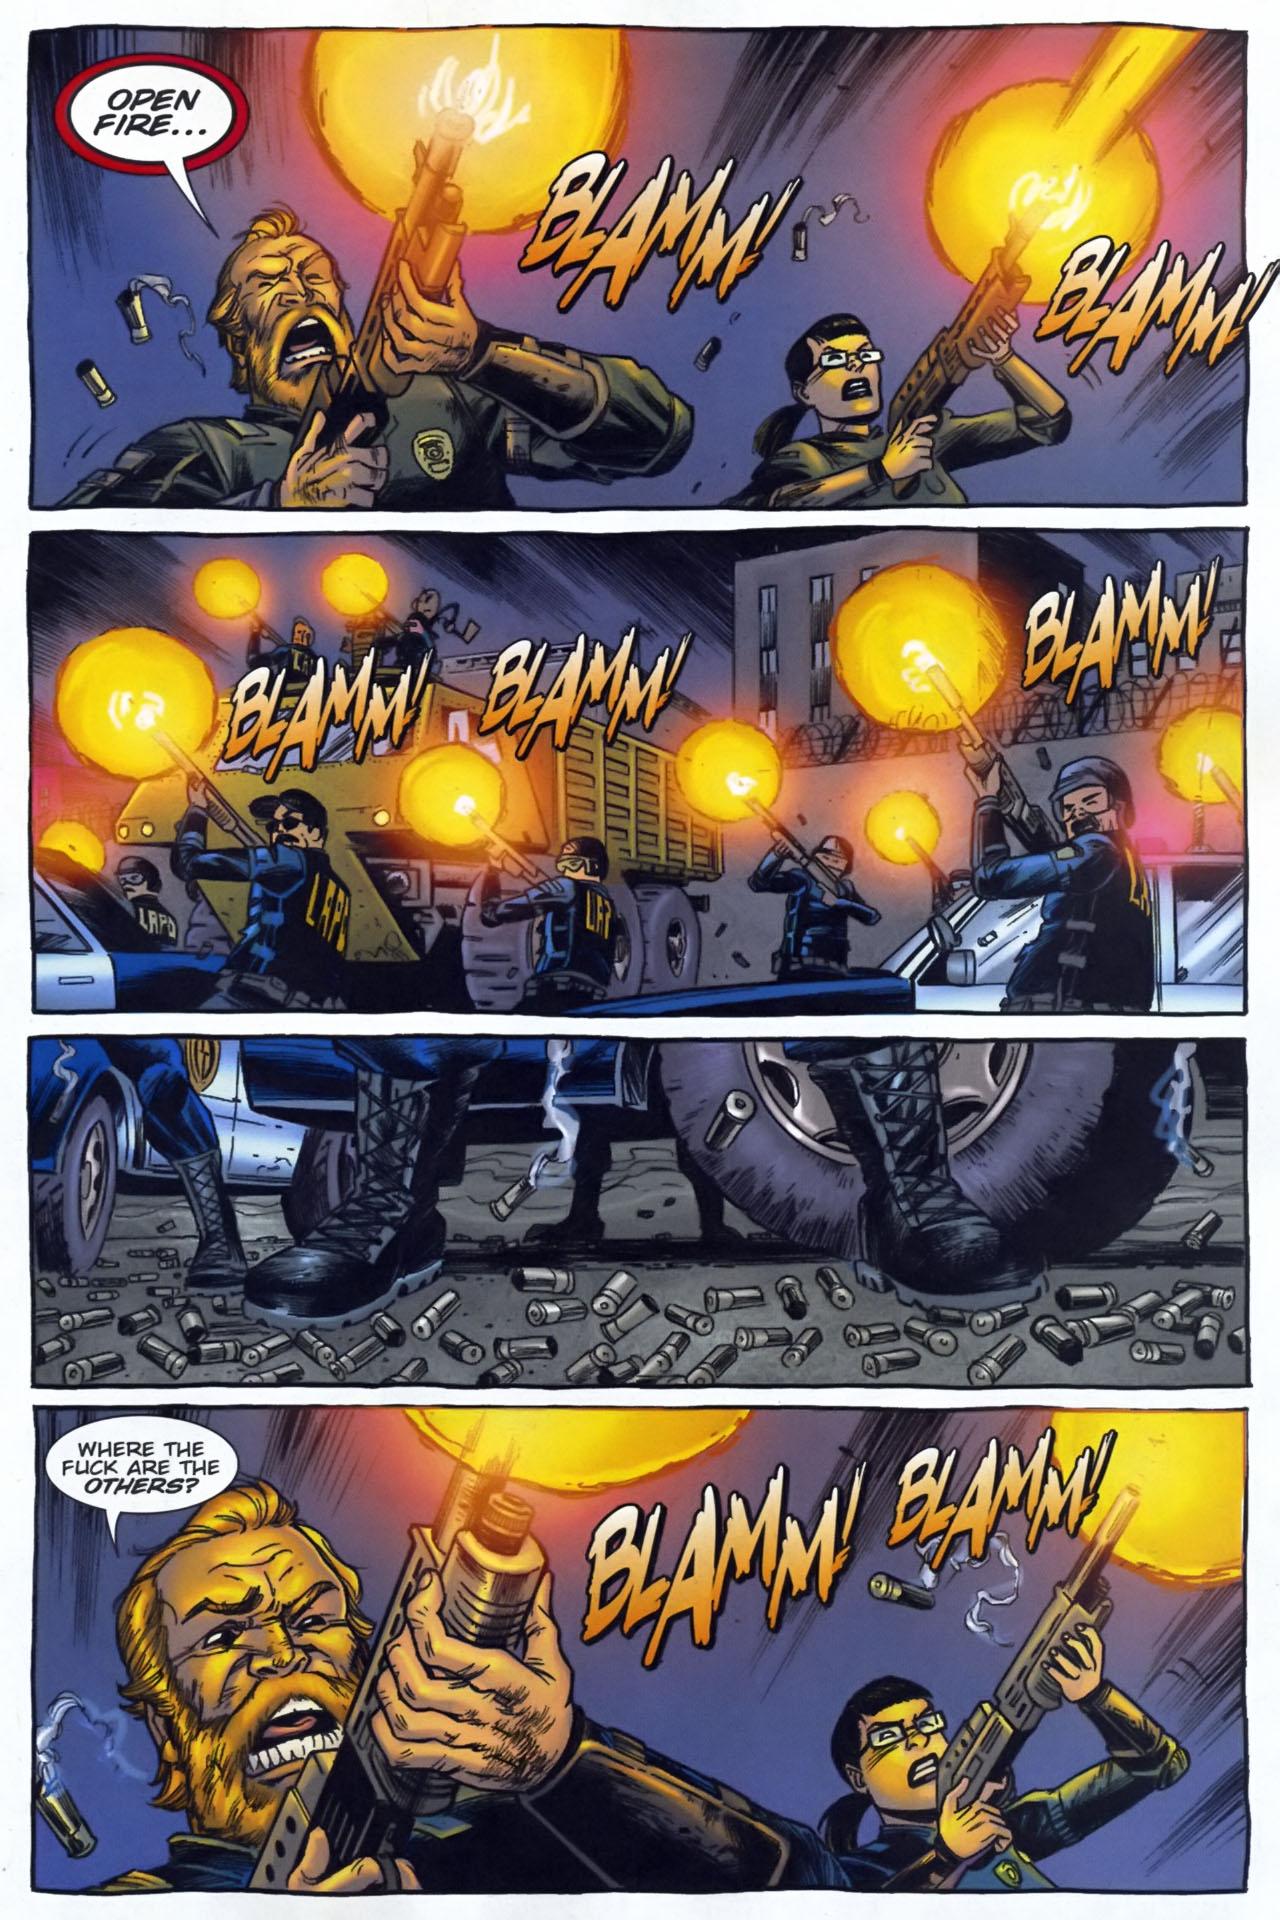 Read online The Exterminators comic -  Issue #29 - 19